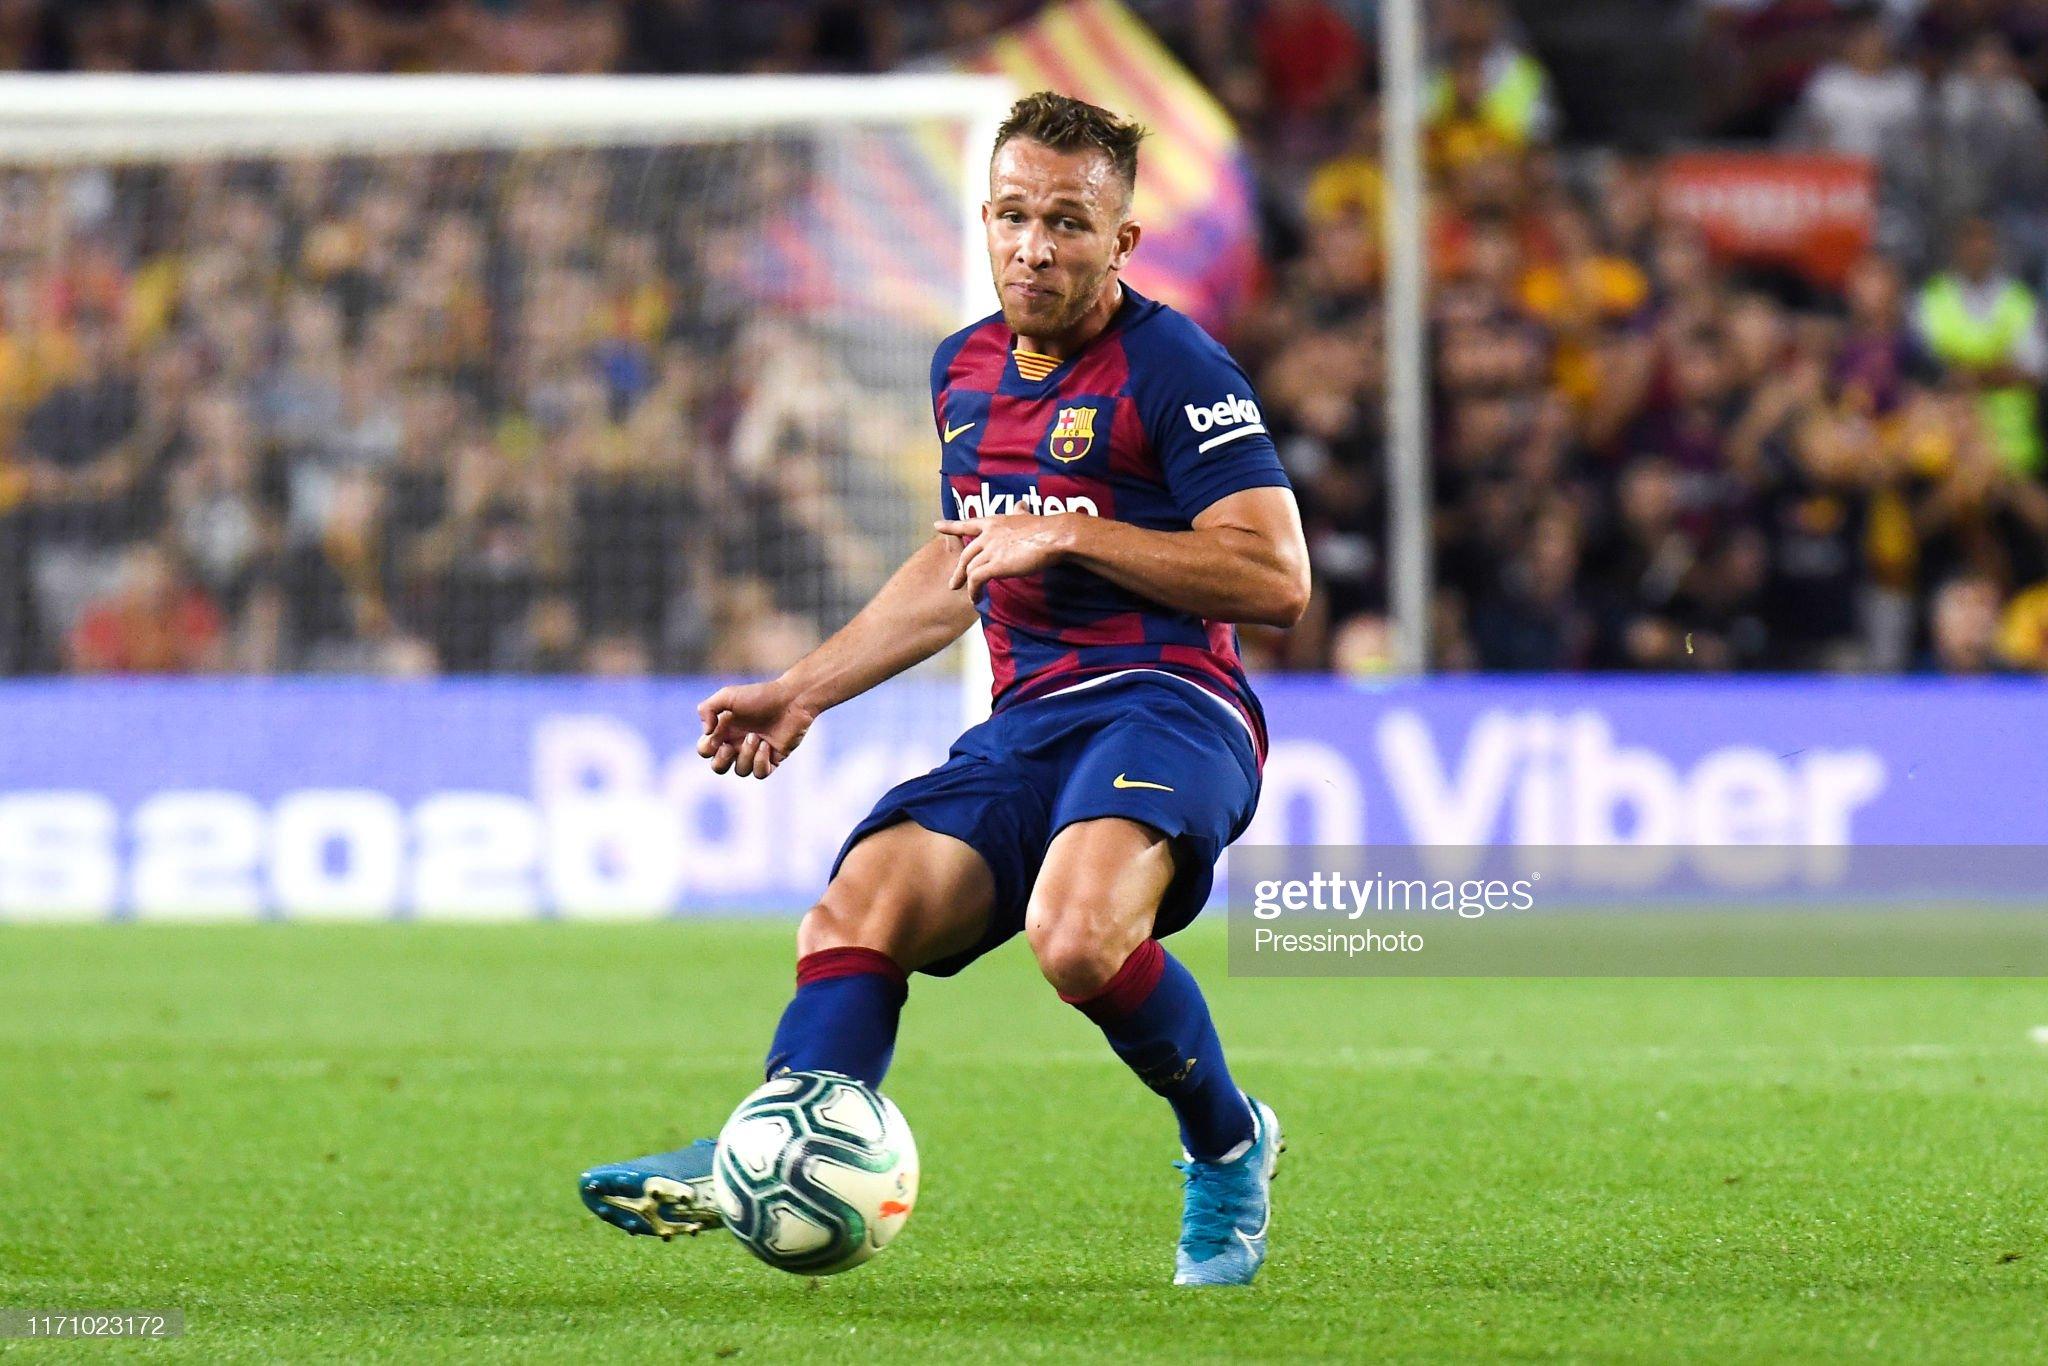 صور مباراة : برشلونة - فياريال 2-1 ( 24-09-2019 )  Arthur-melo-of-fc-barcelona-during-the-liga-match-between-barcelona-picture-id1171023172?s=2048x2048